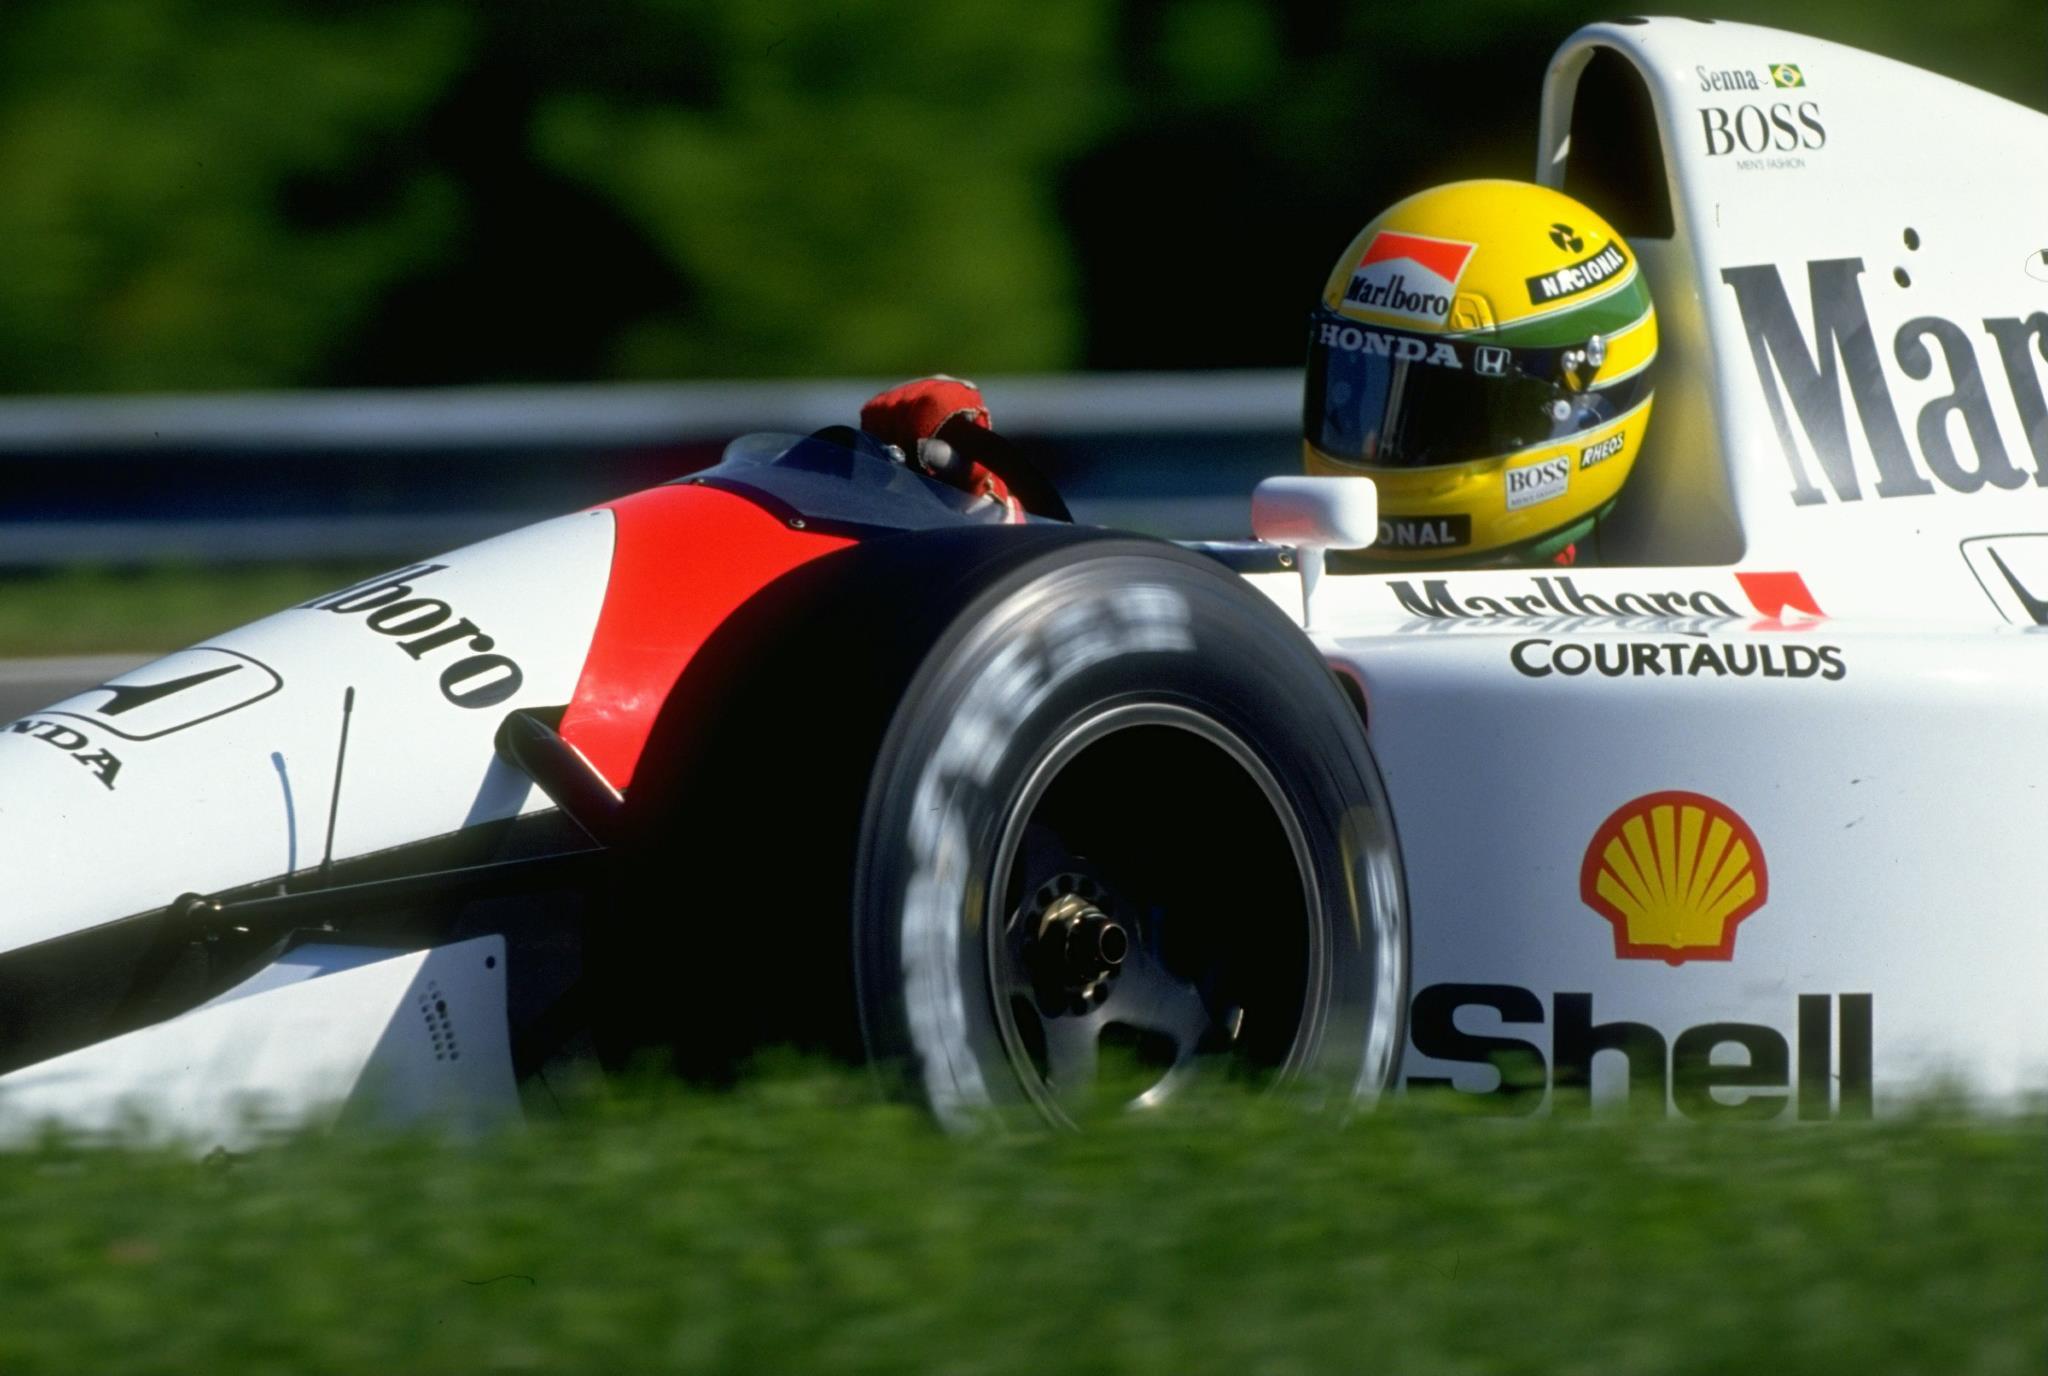 Ayrton Senna The God Of Speed